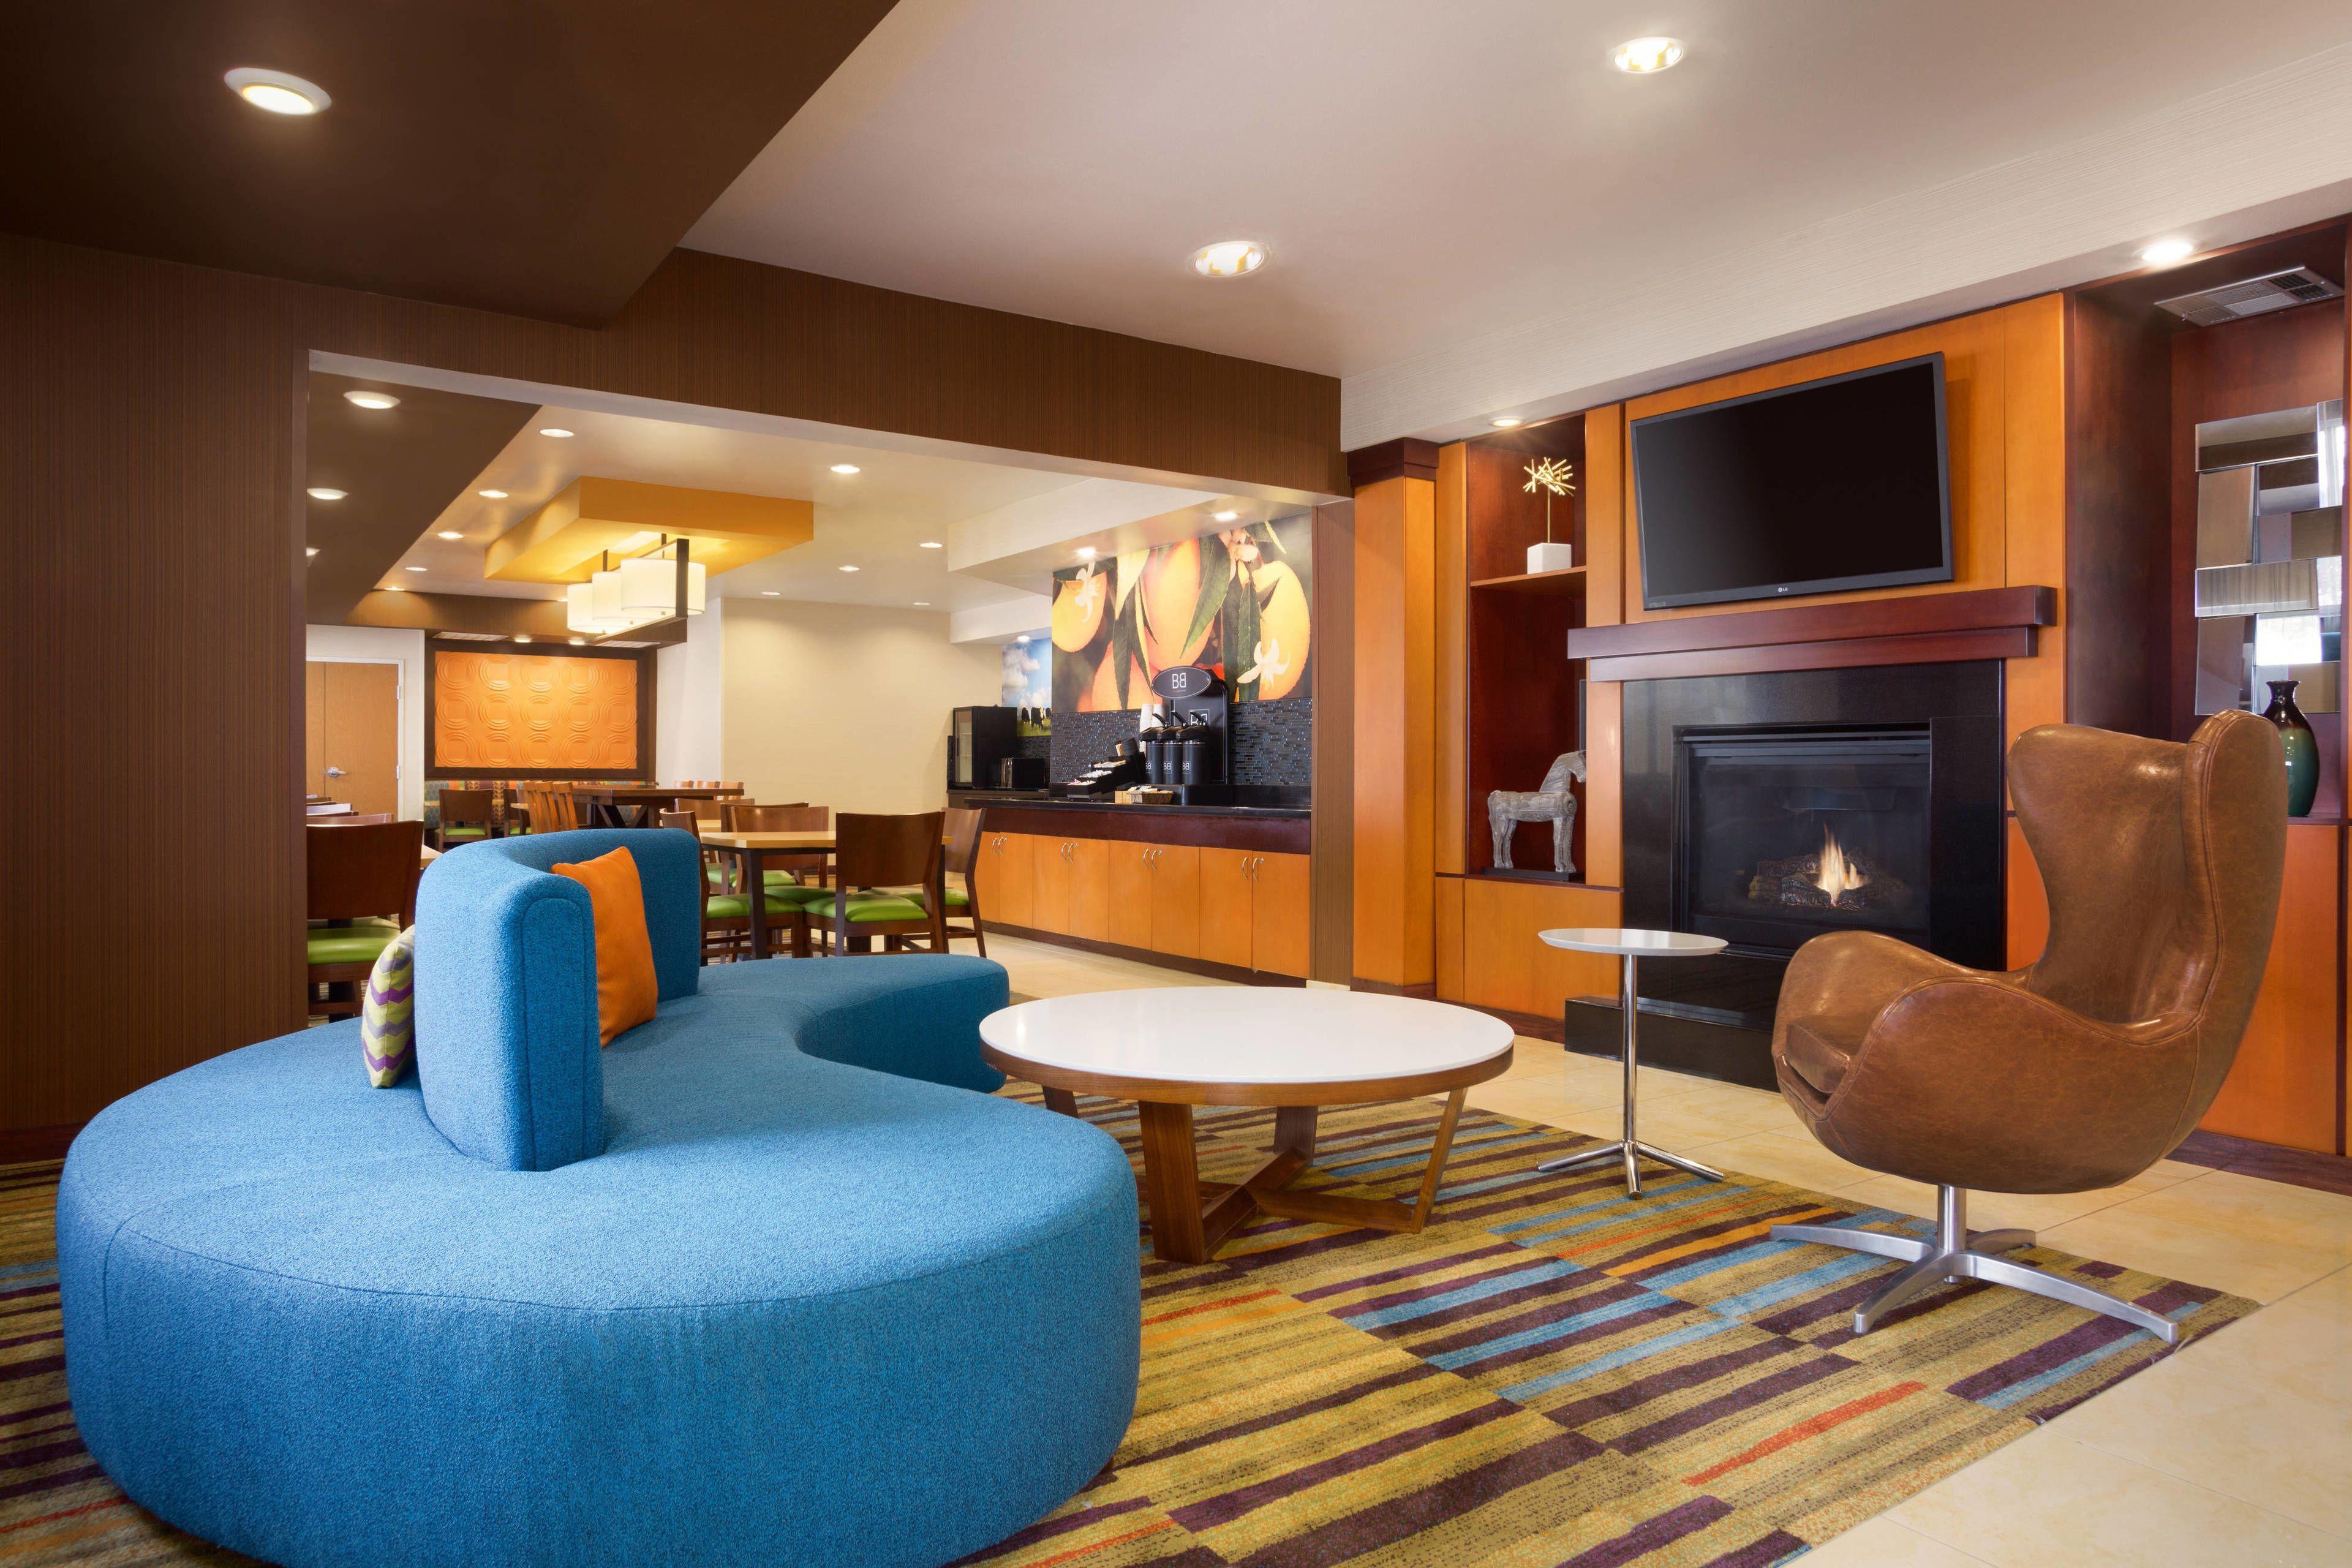 Courtesy of Fairfield Inn and Suites Houston Energy Corridor/Katy Freeway / Expedia